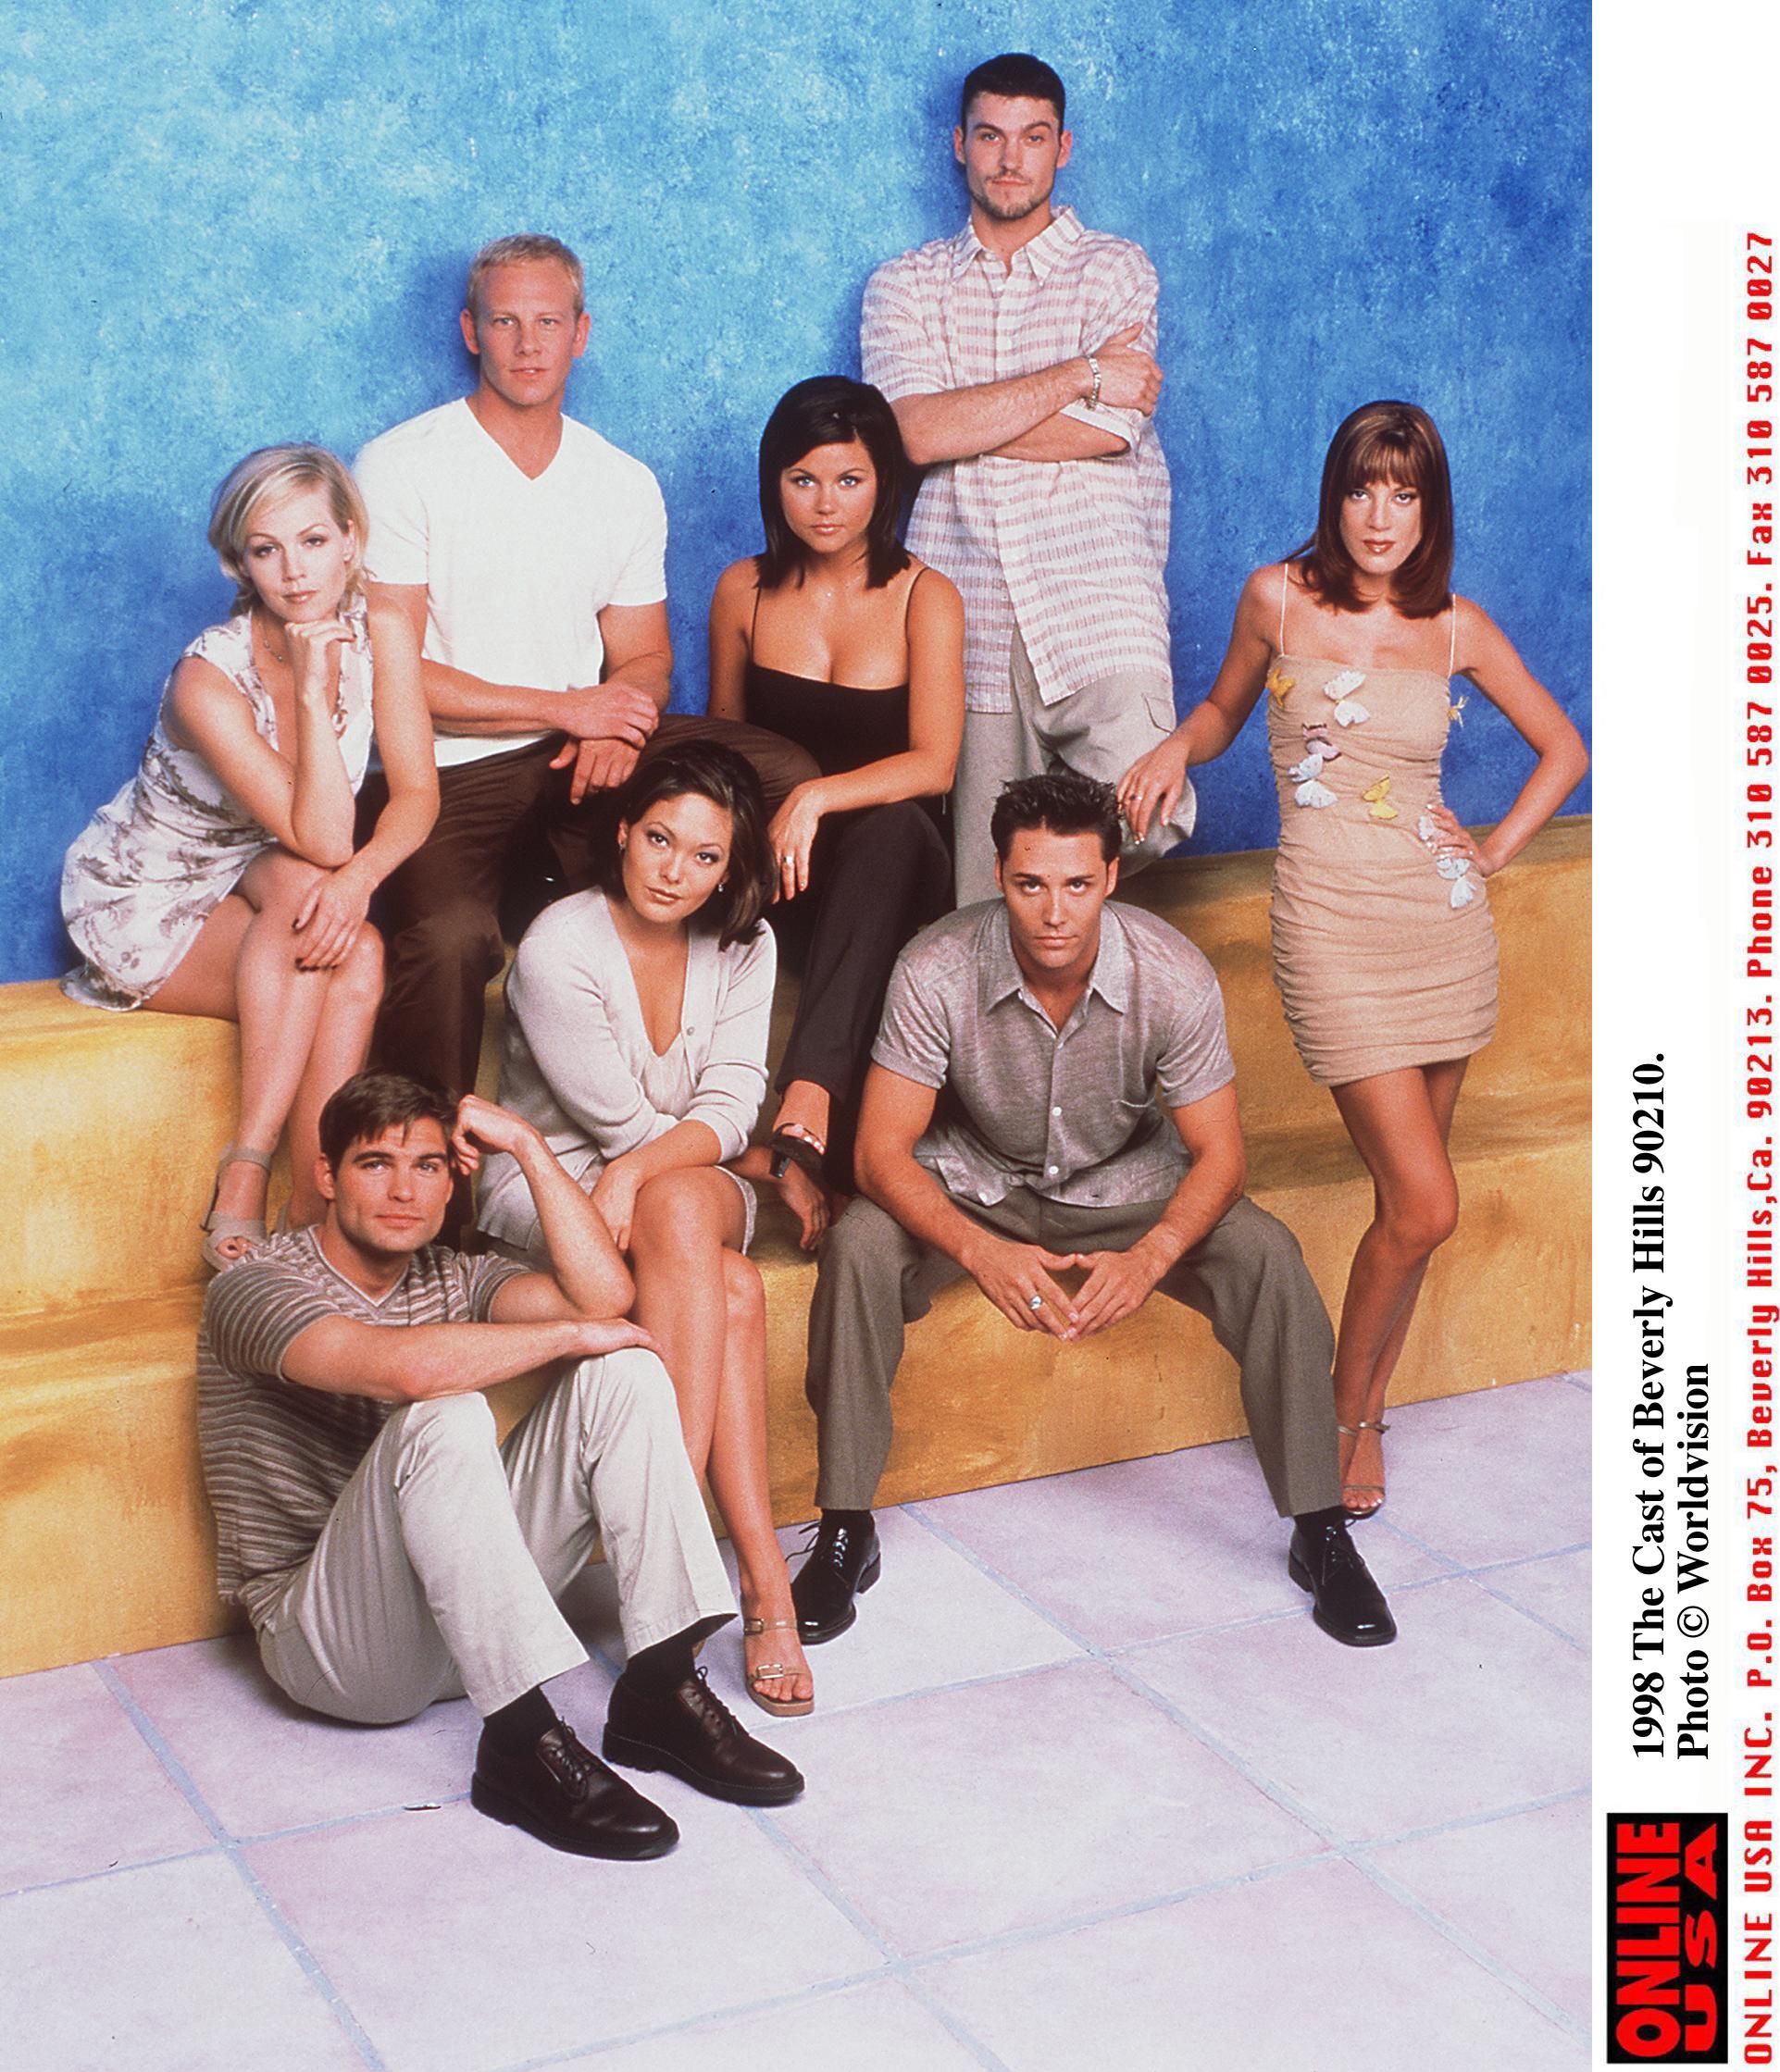 Elenco de Beverly Hills, 90210